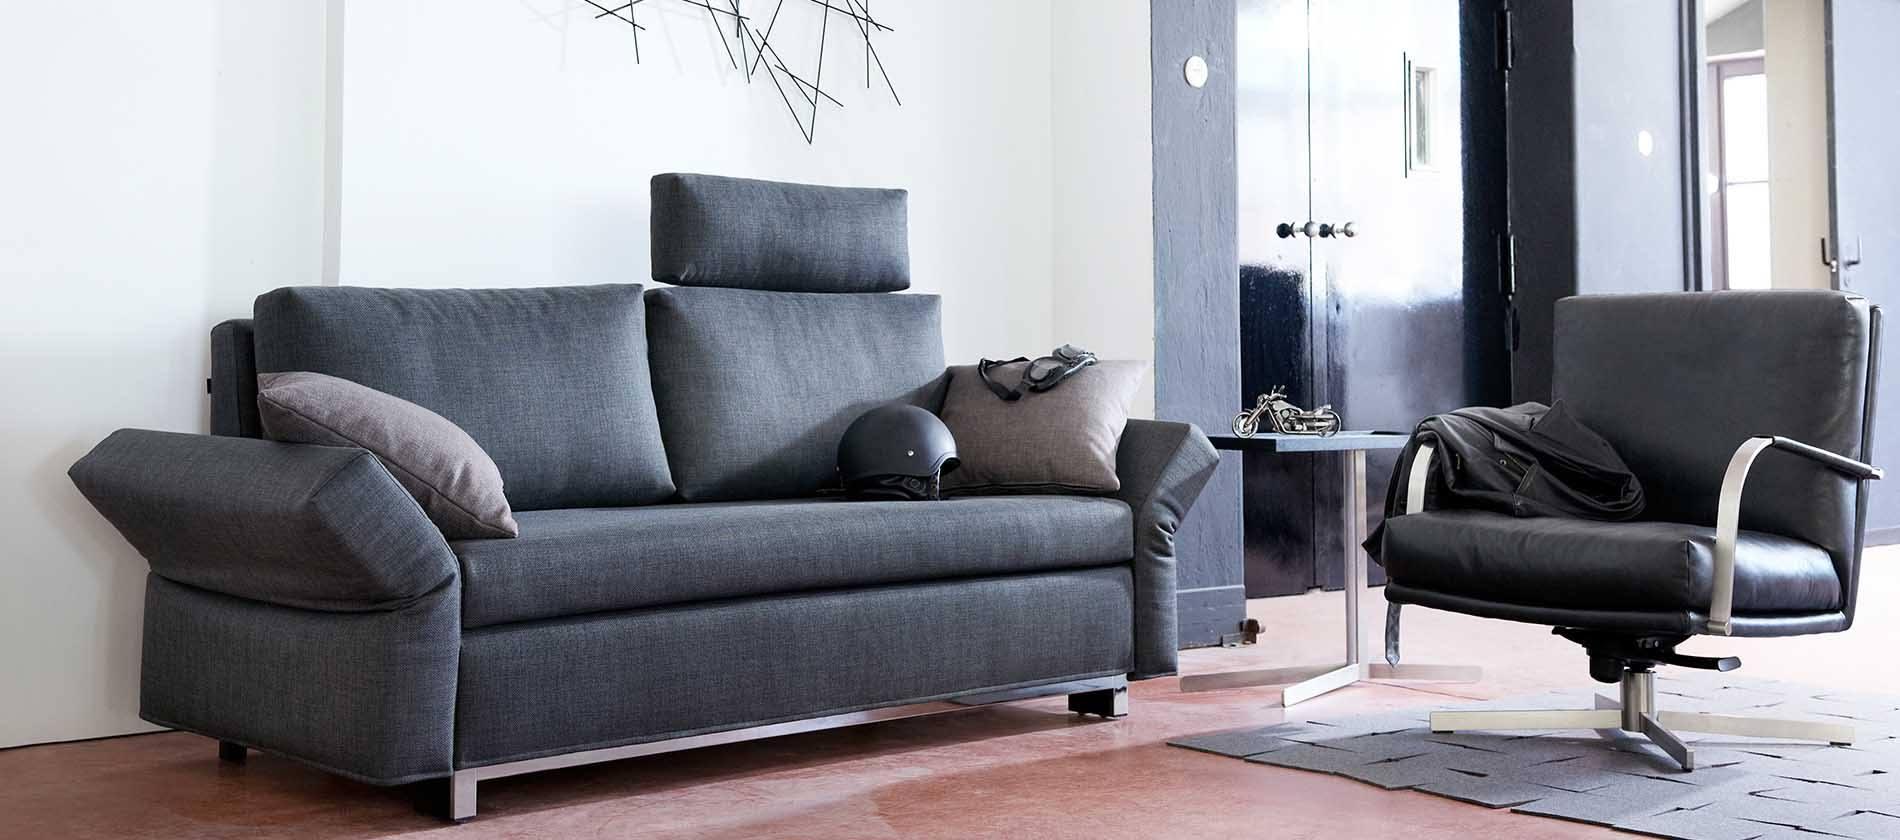 schlafsofa zwei personen beautiful schlafsofa design bezaubernd schlafsofas fr zwei personen. Black Bedroom Furniture Sets. Home Design Ideas